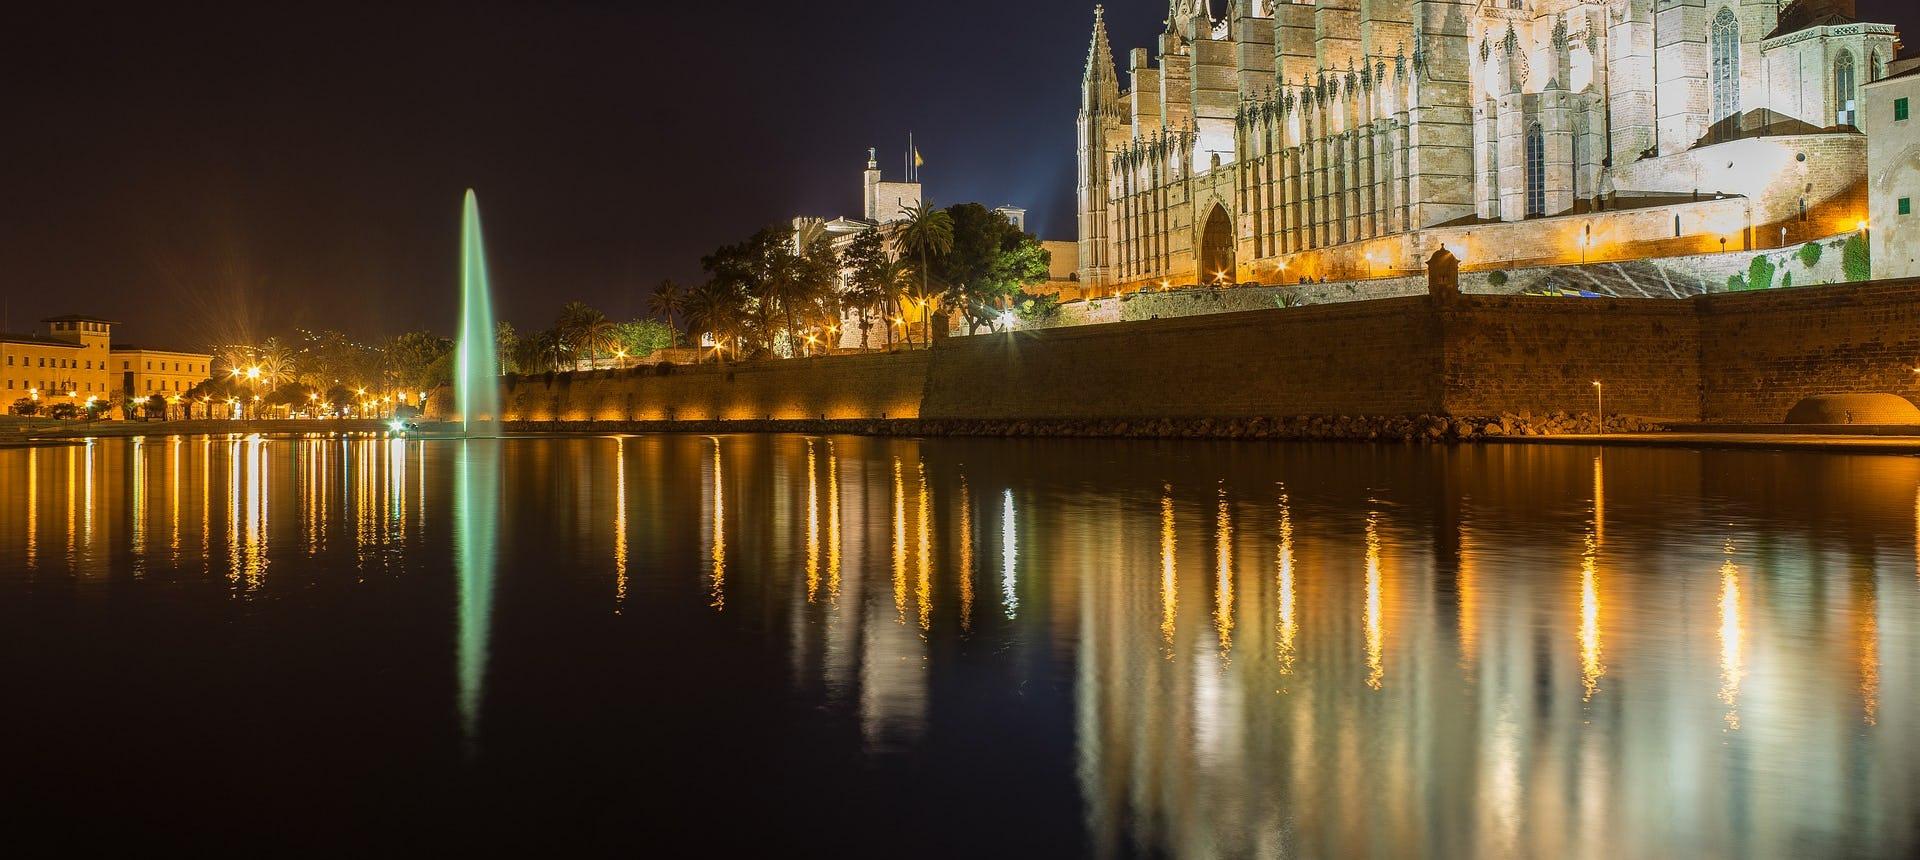 Katedralen i Palma de Mallorca © Heiko Behrendt, Pixabay